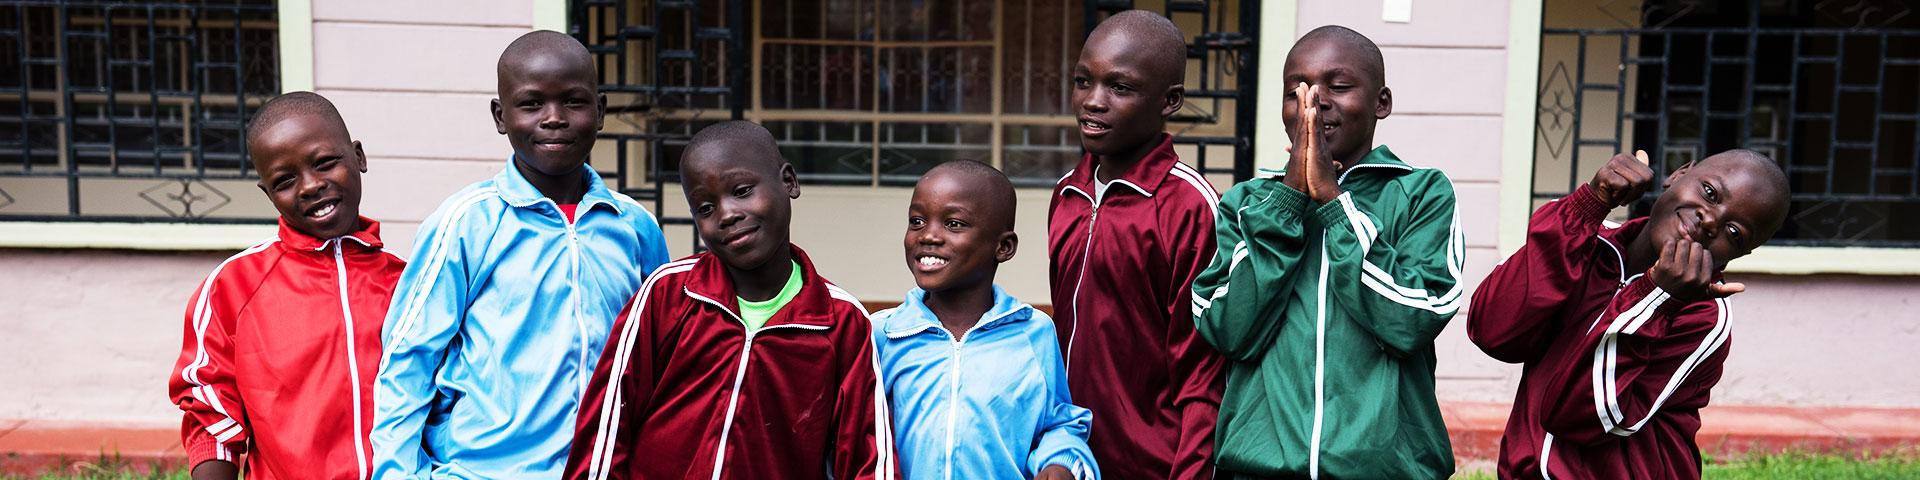 Boys of the Reach International Children's Center Bungoma Kenya